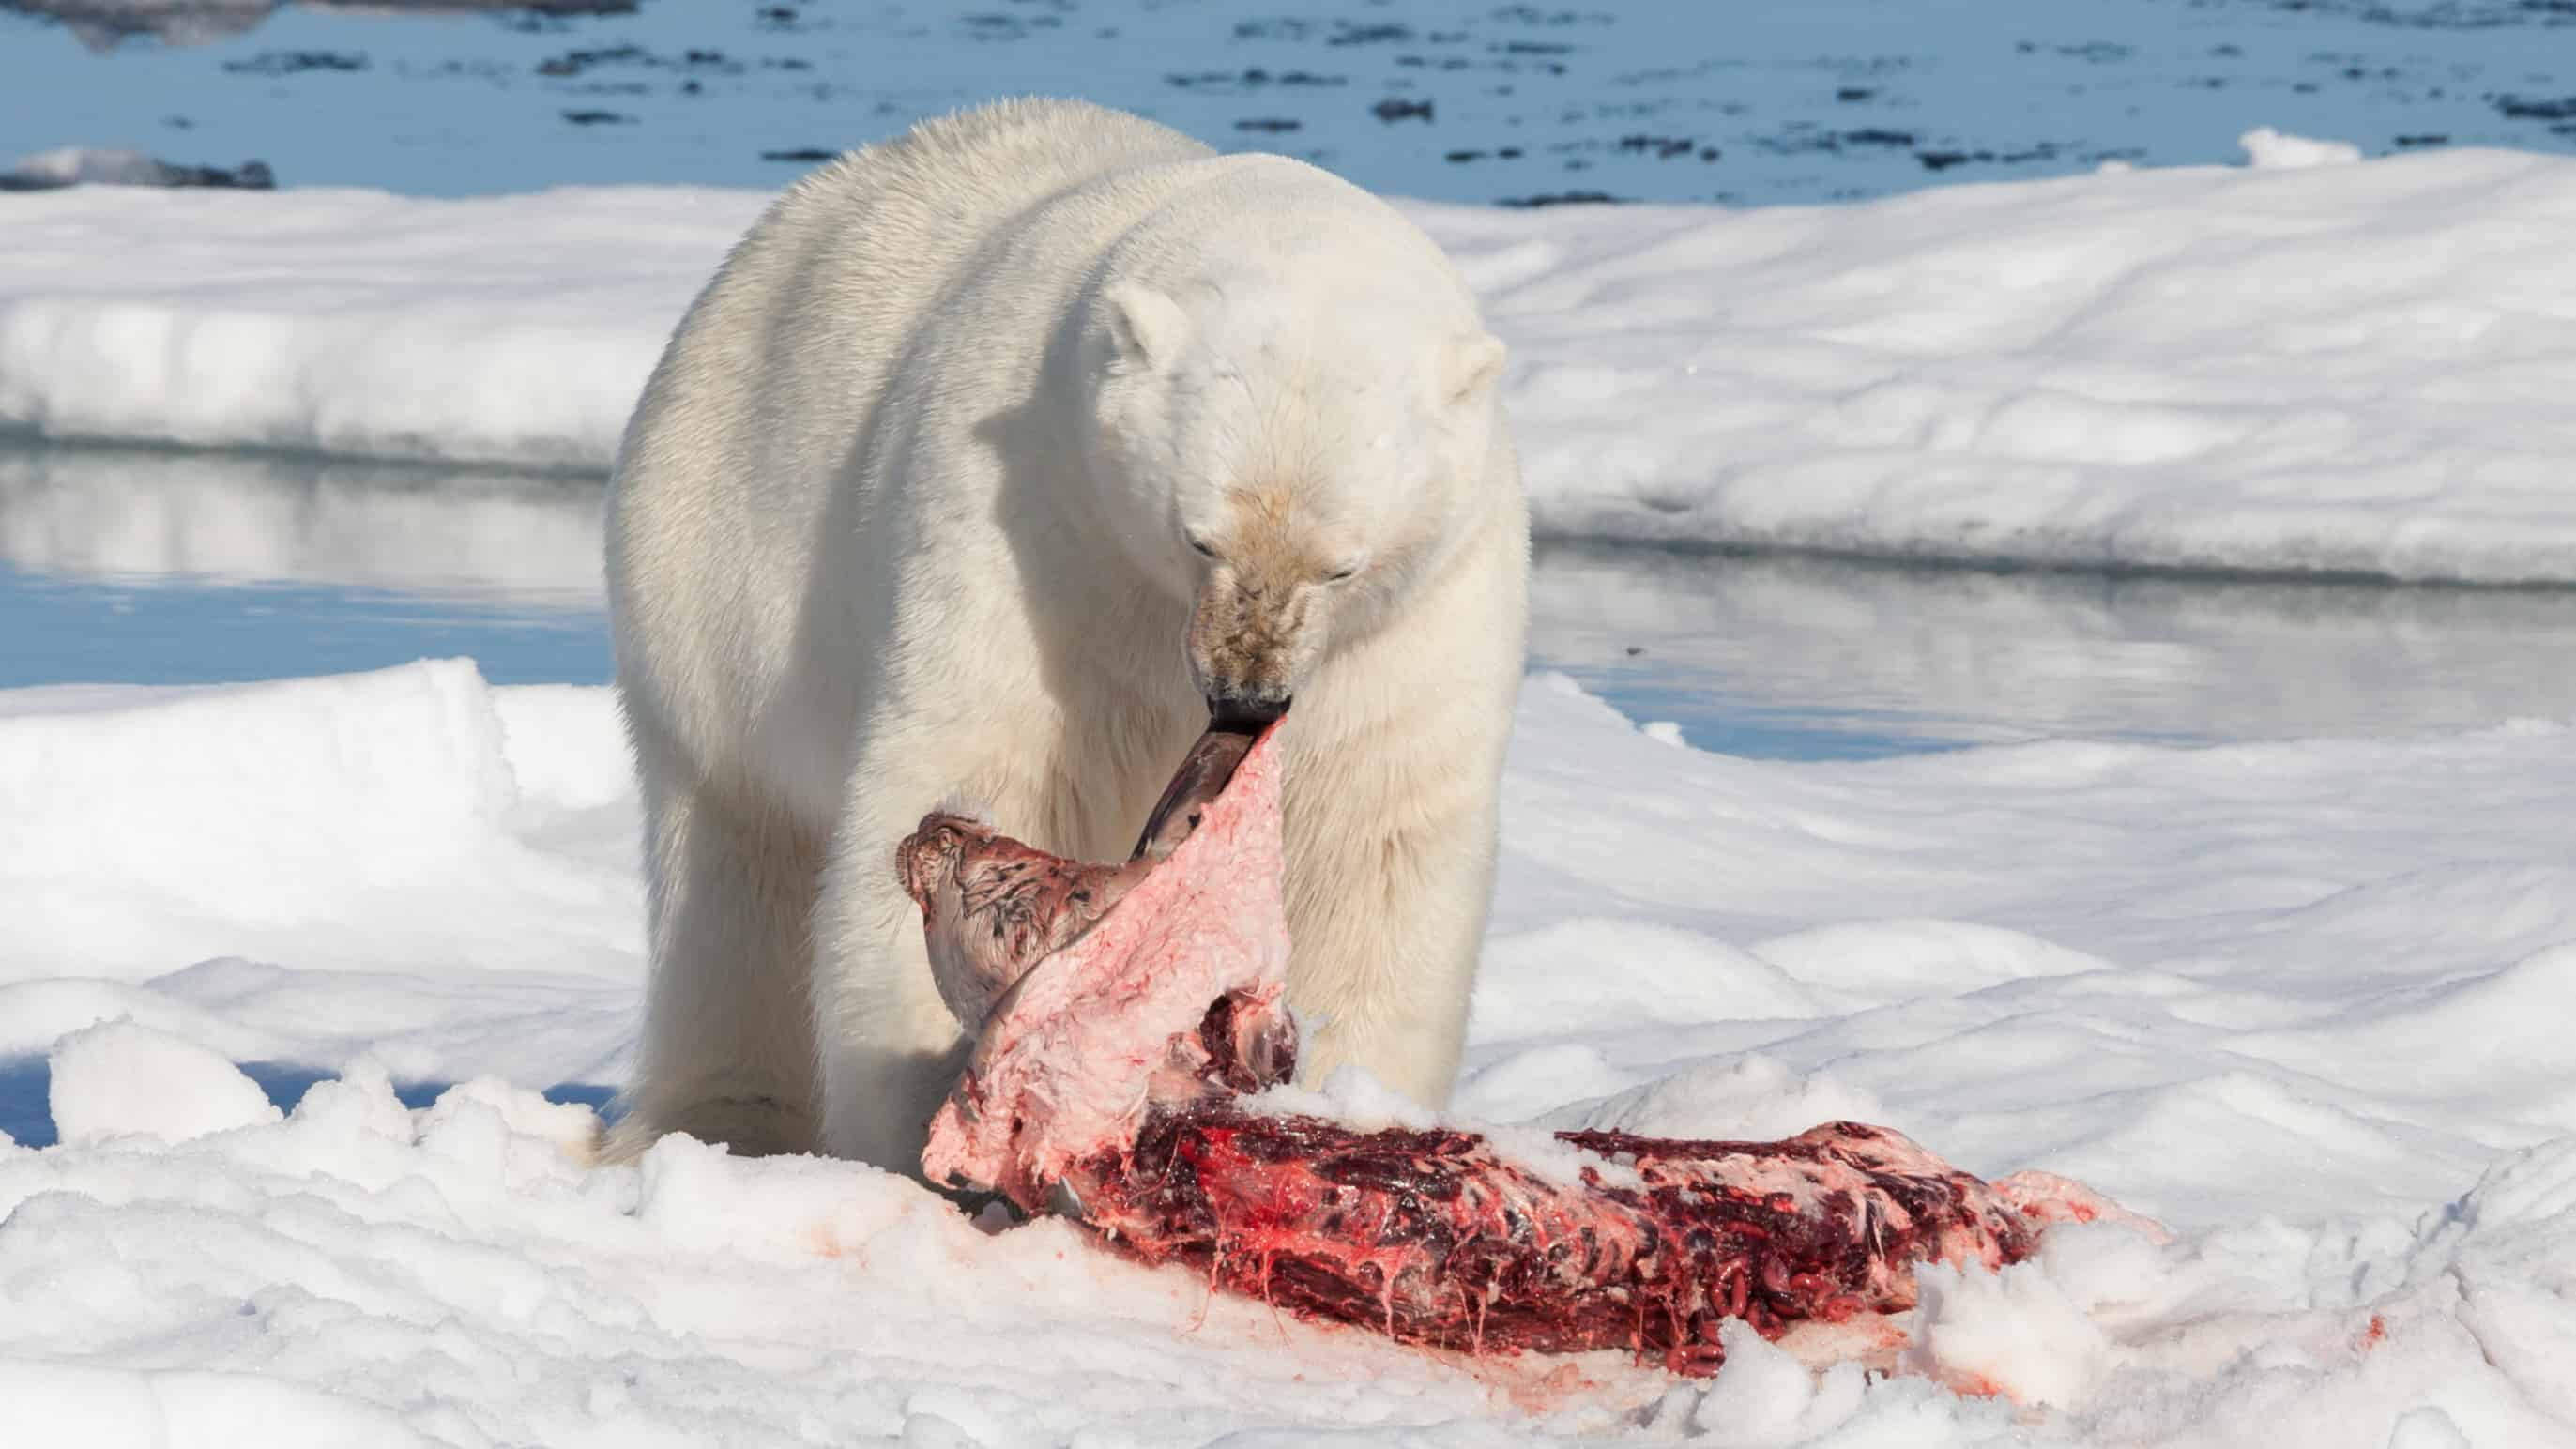 What does Polar bear eat?